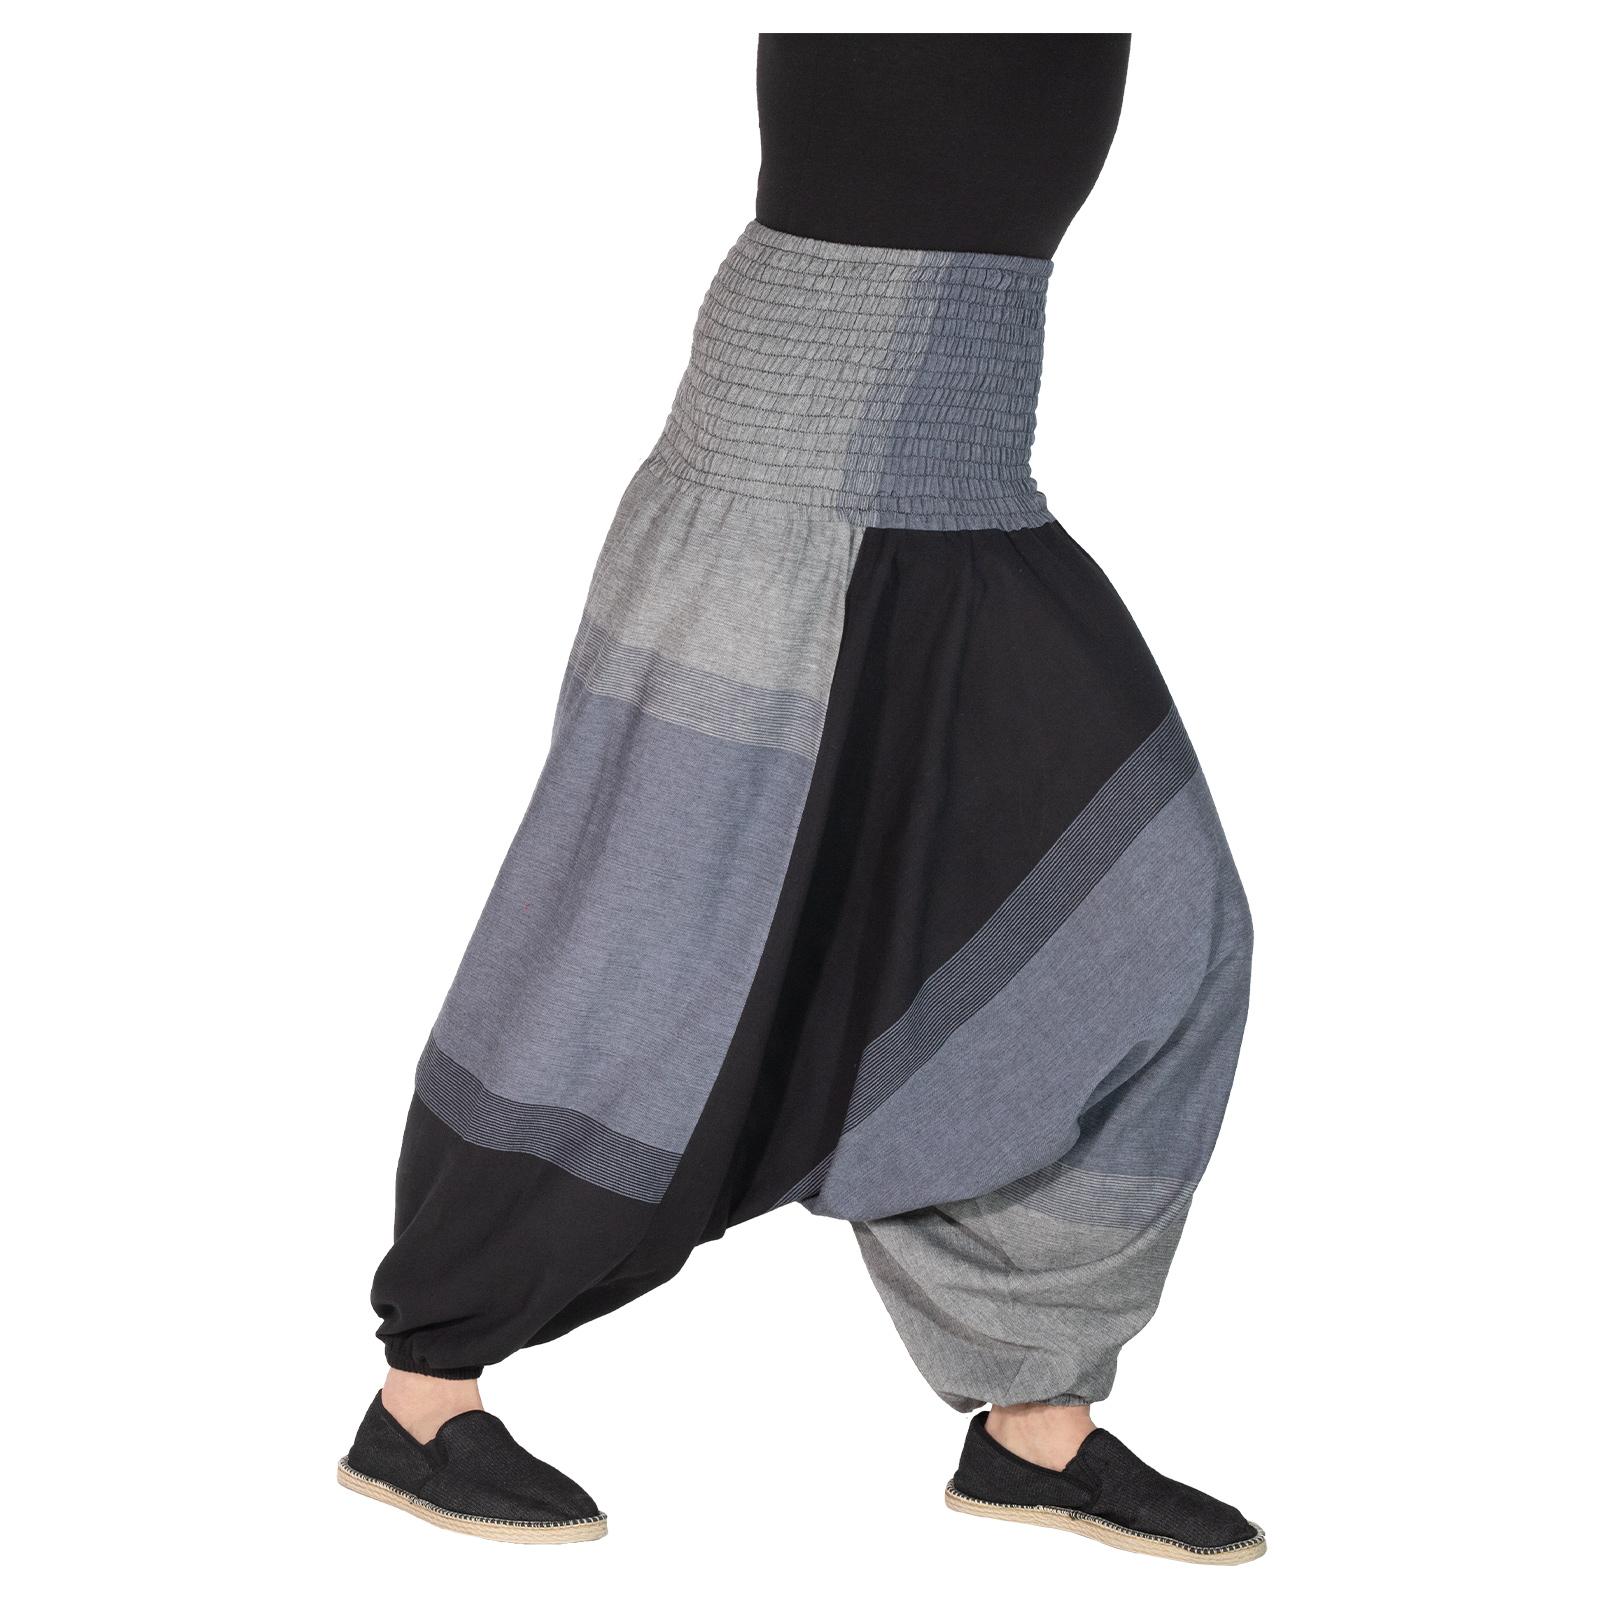 Kunst Und Magie Damen Bunt One Size Boho Yoga Haremshose Freizeithose Aladinhose Kunst Und Magie